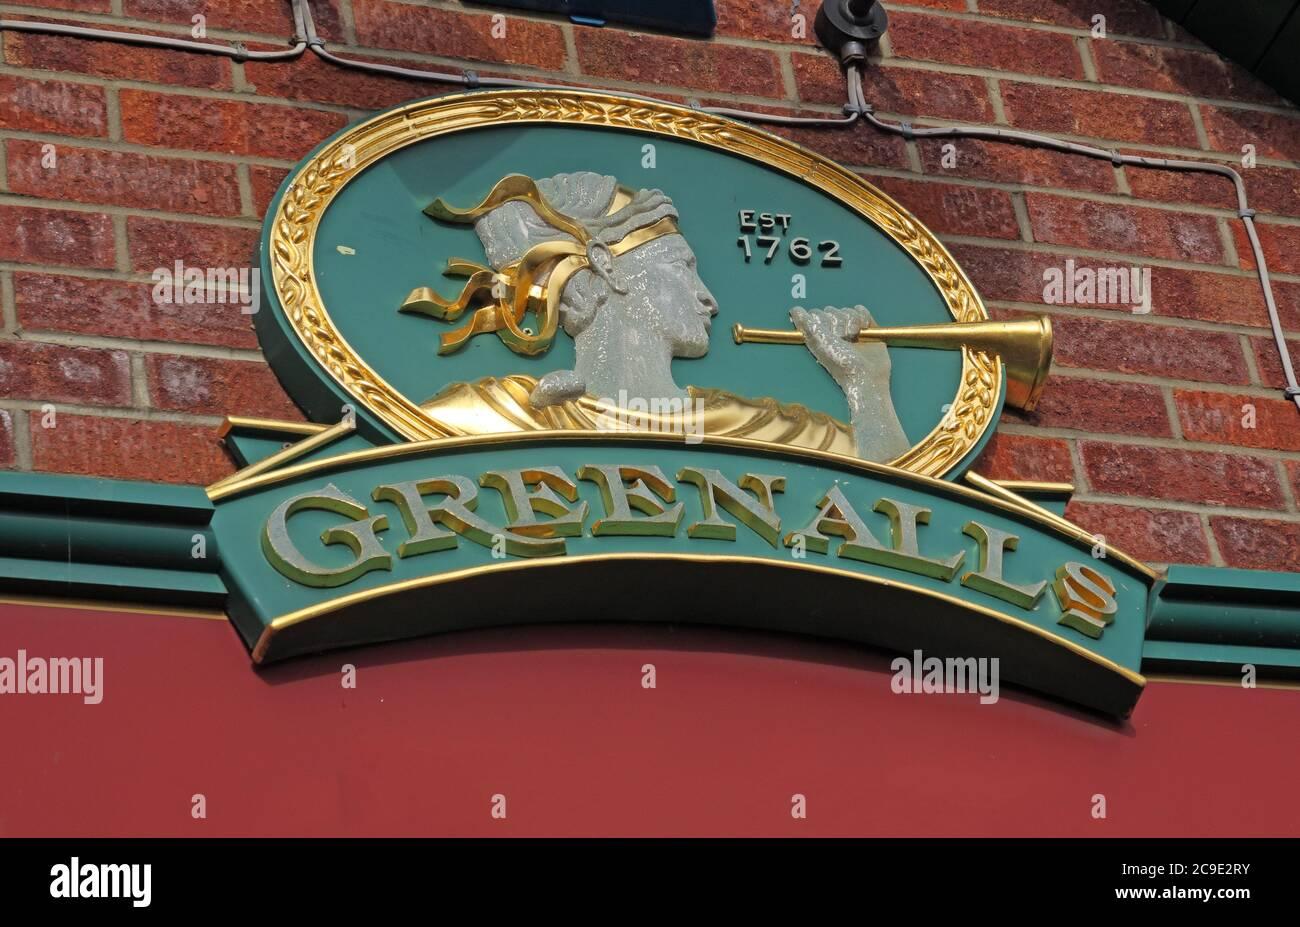 Dieses Stockfoto: Greenalls Brewery Sign, Bridgwater, Somerset, Südwestengland, - 2C9E2R